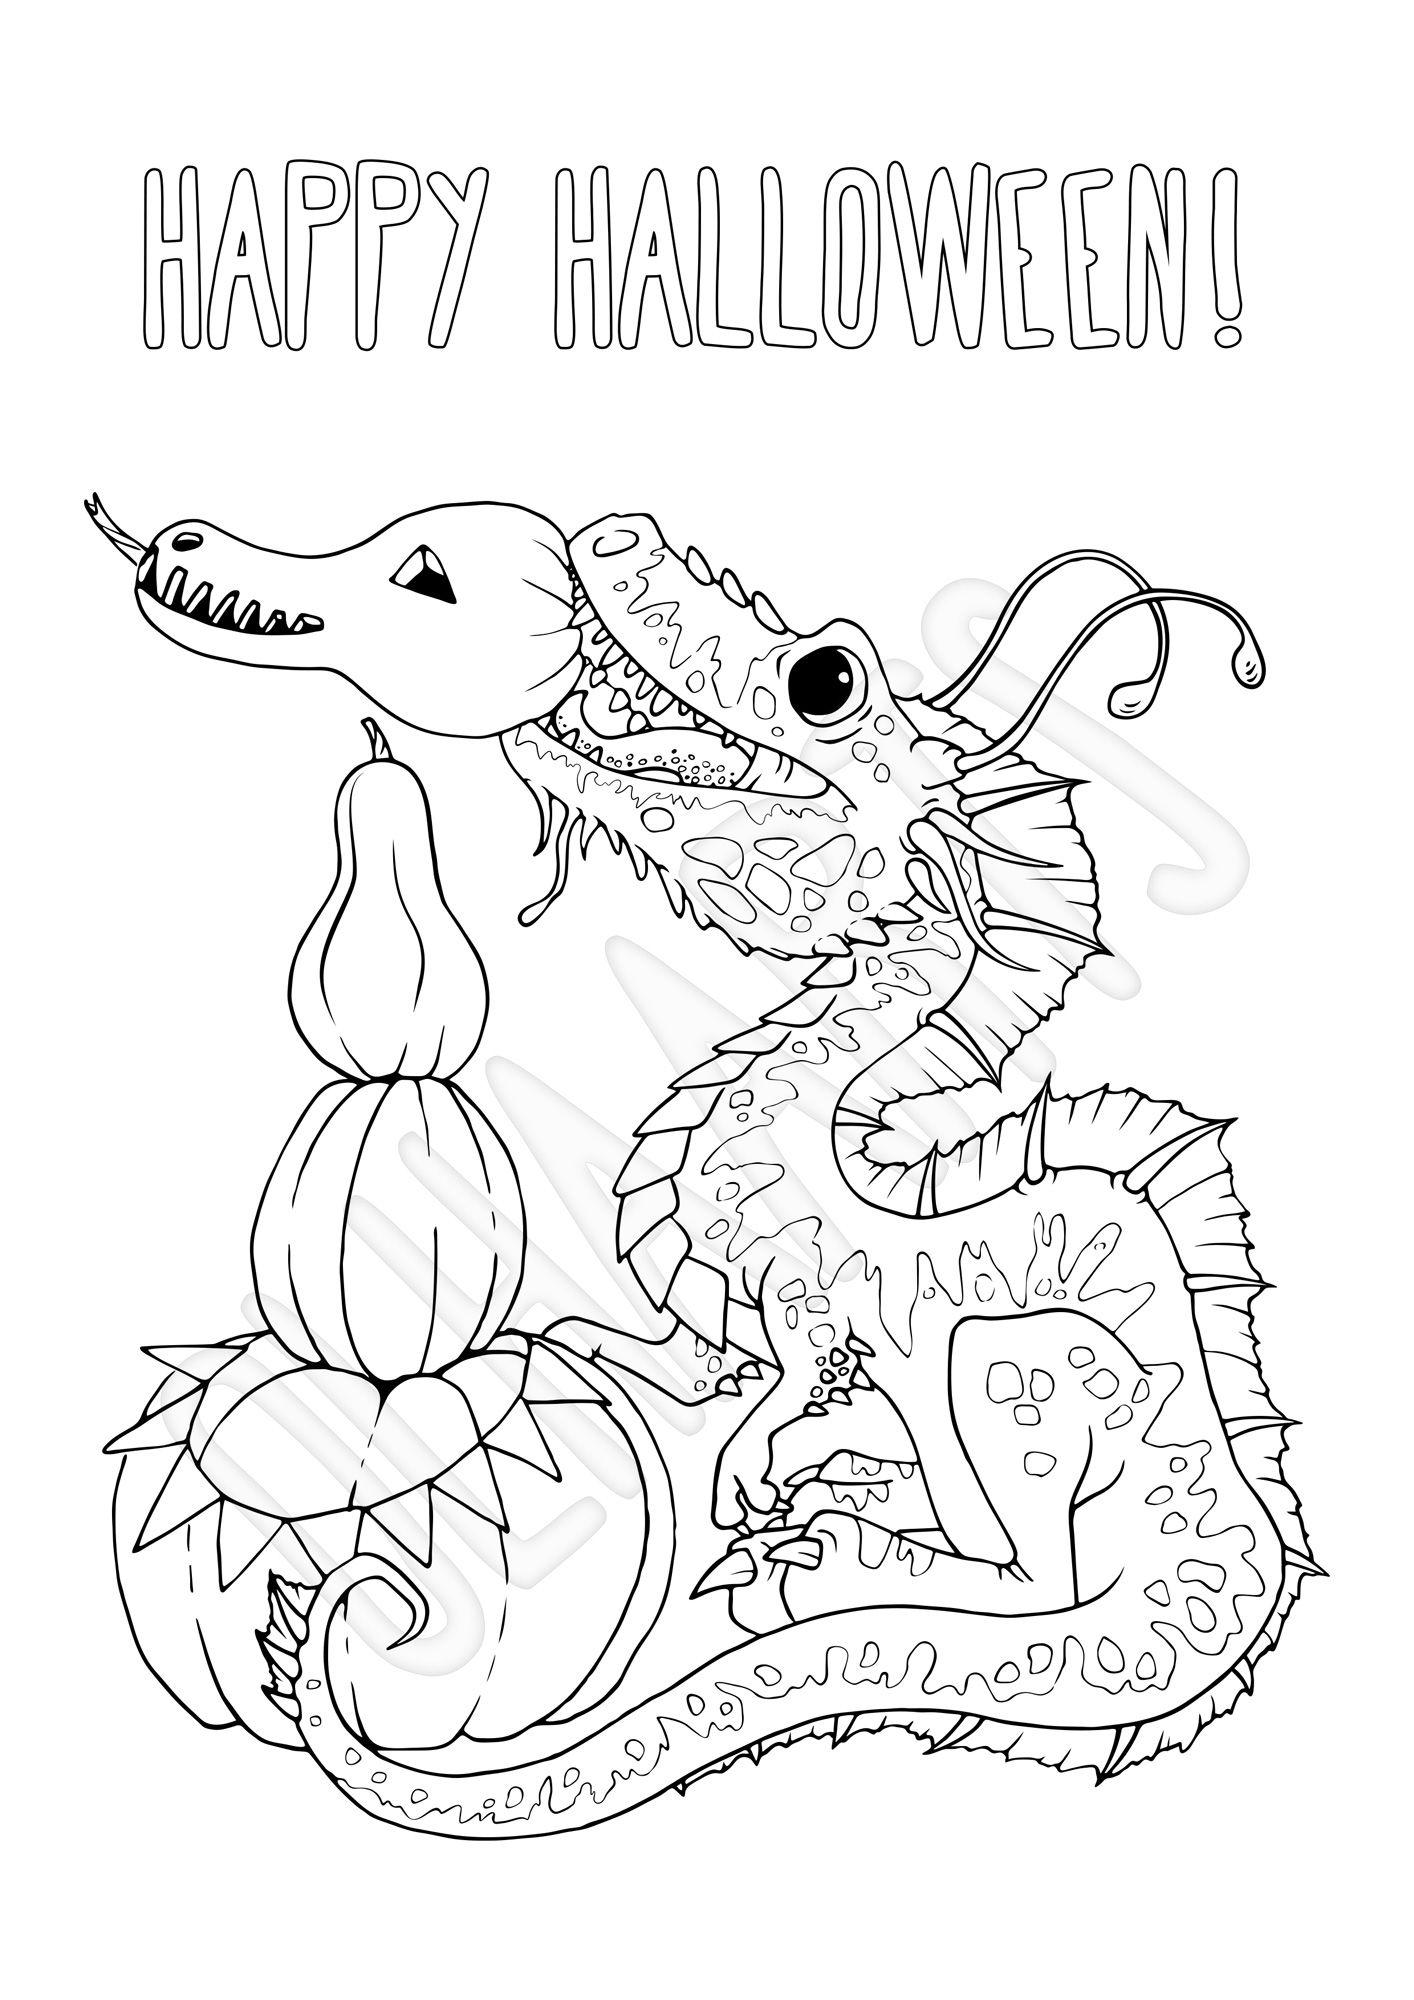 Halloween Dragon with Pumpkins, a Printable Coloring Page